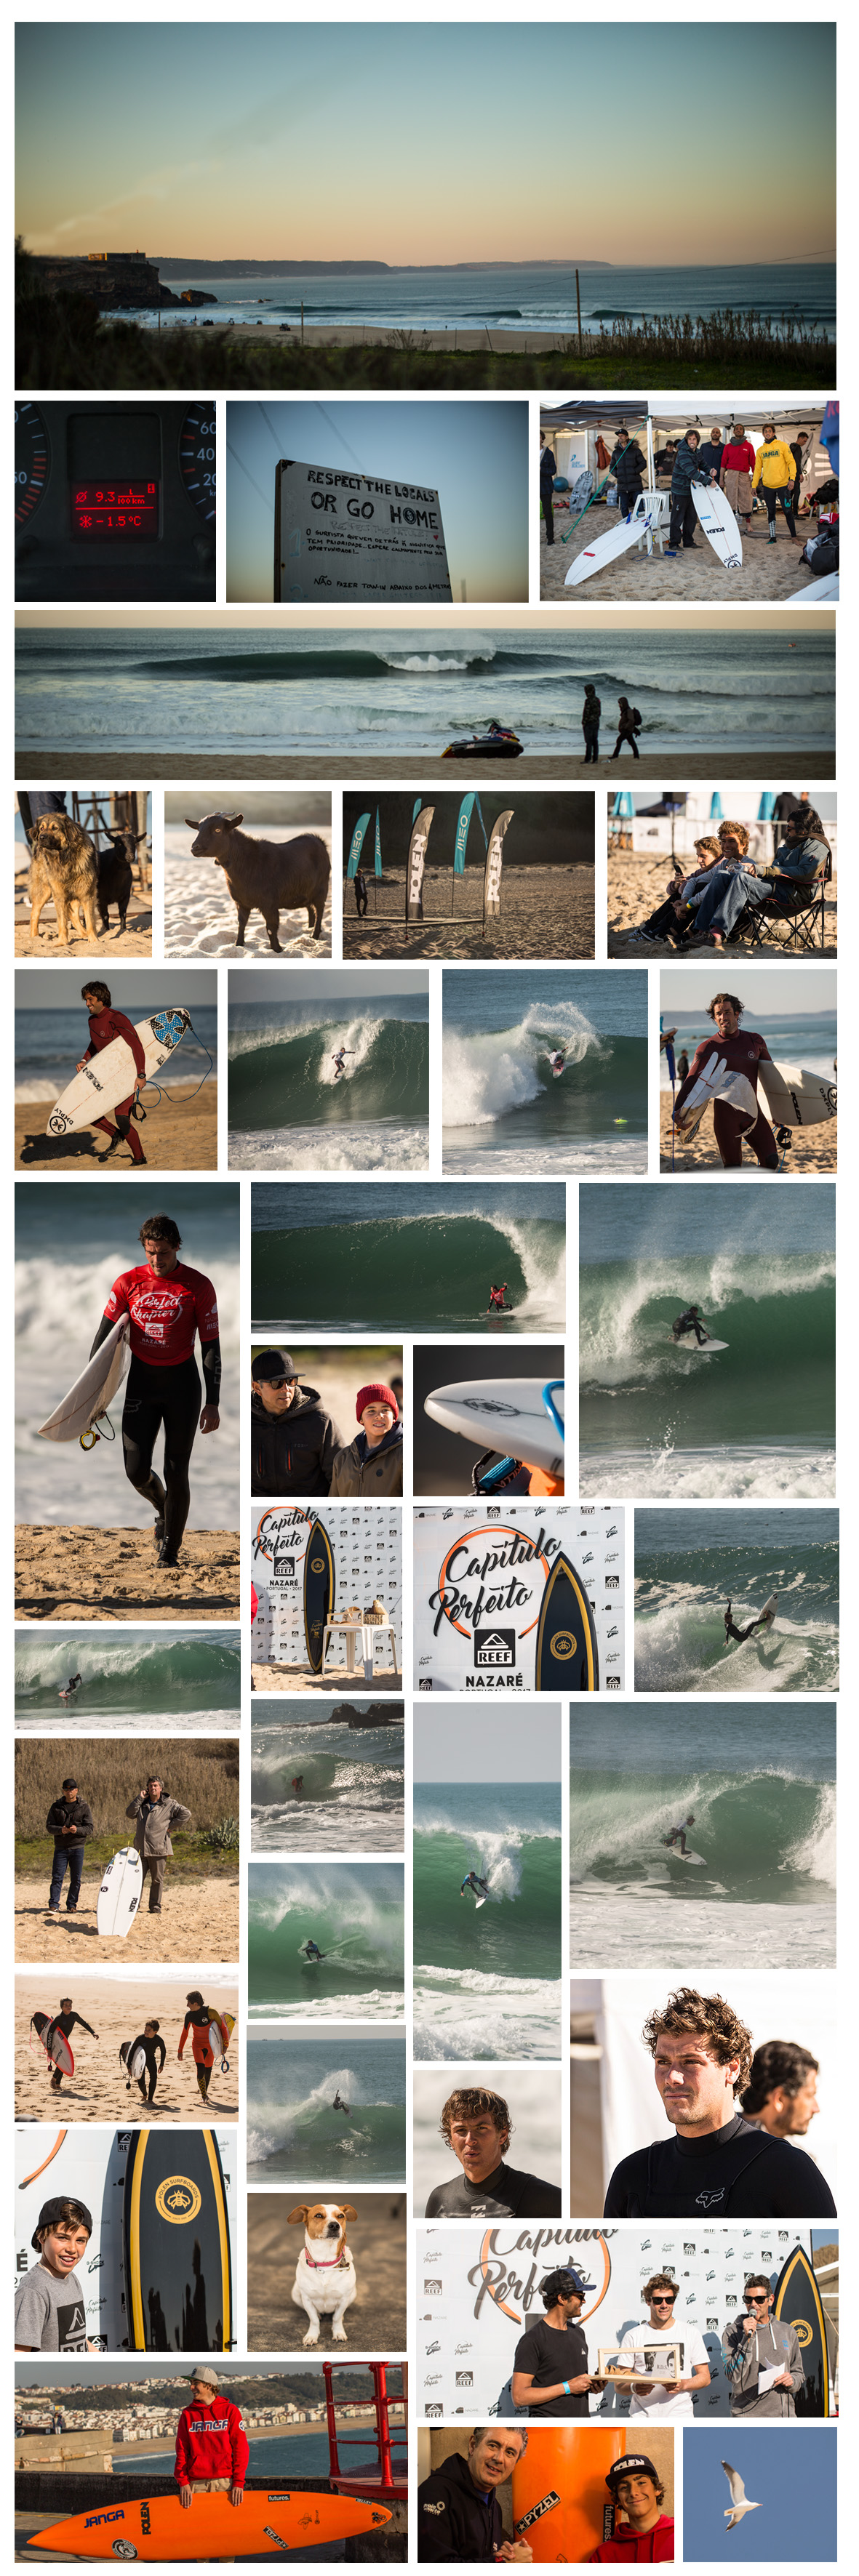 POLEN SURFBOARDS @ CAPÍTULO PERFEITO